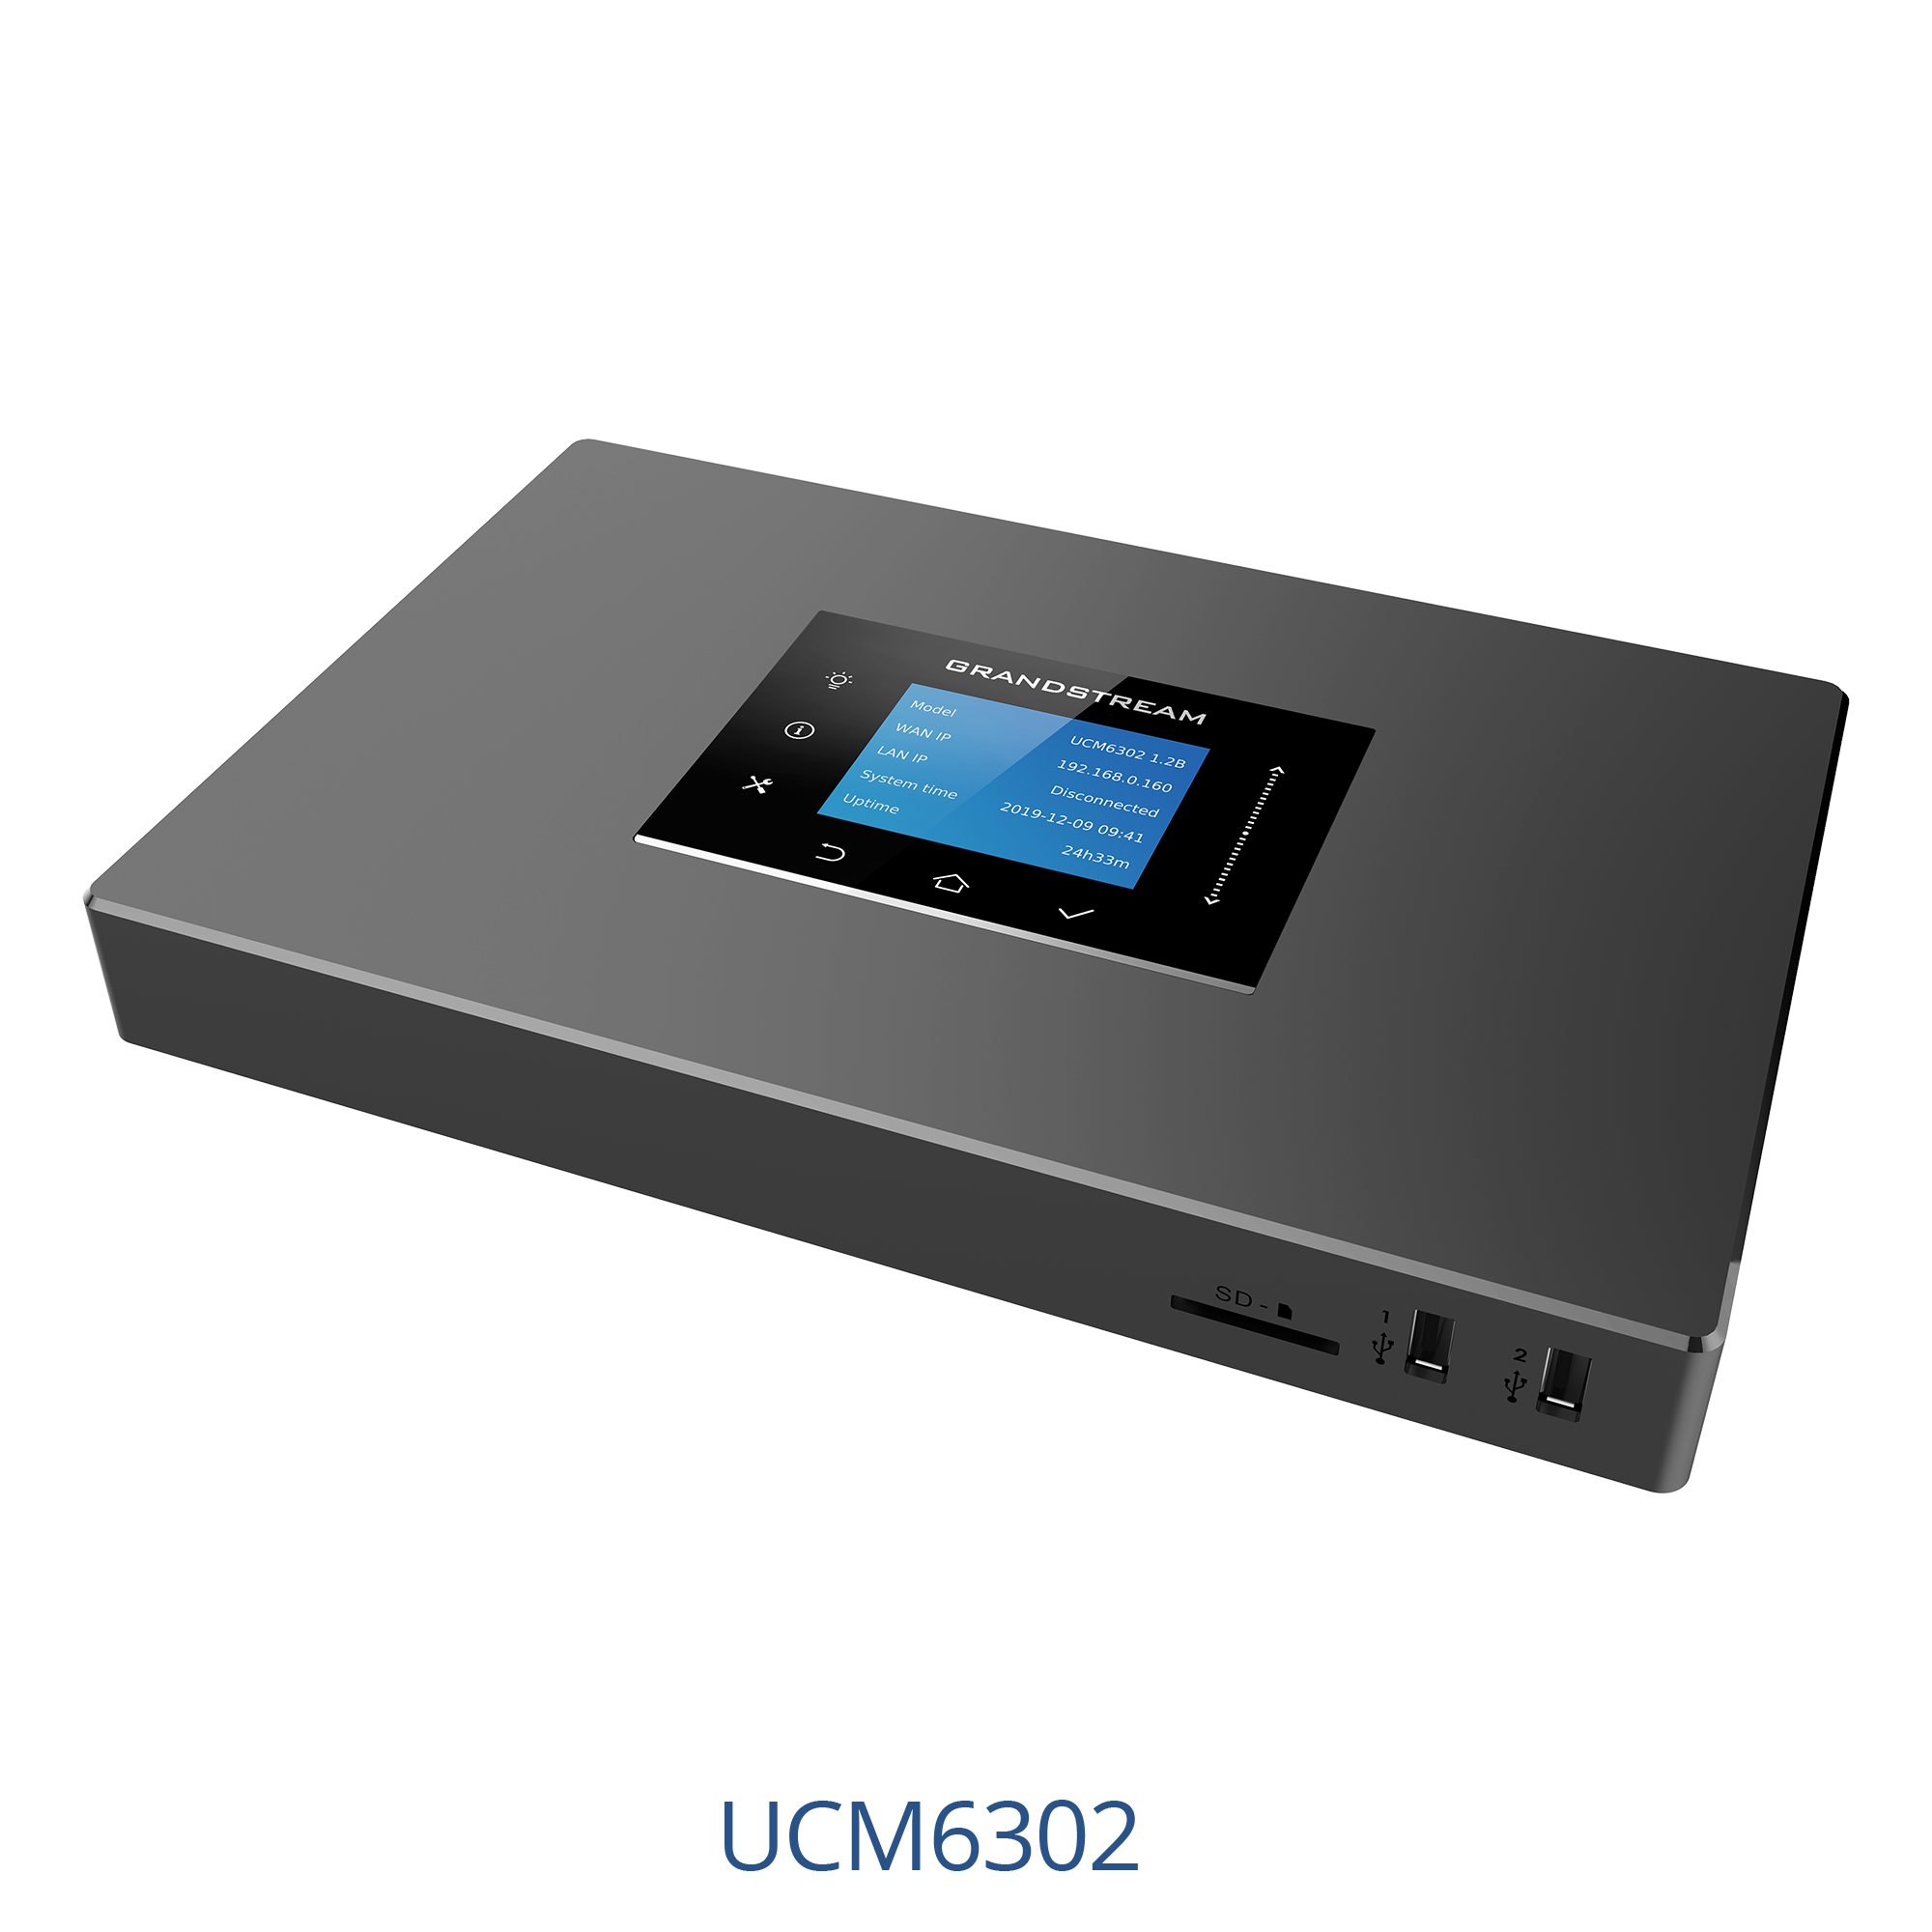 UCM6302